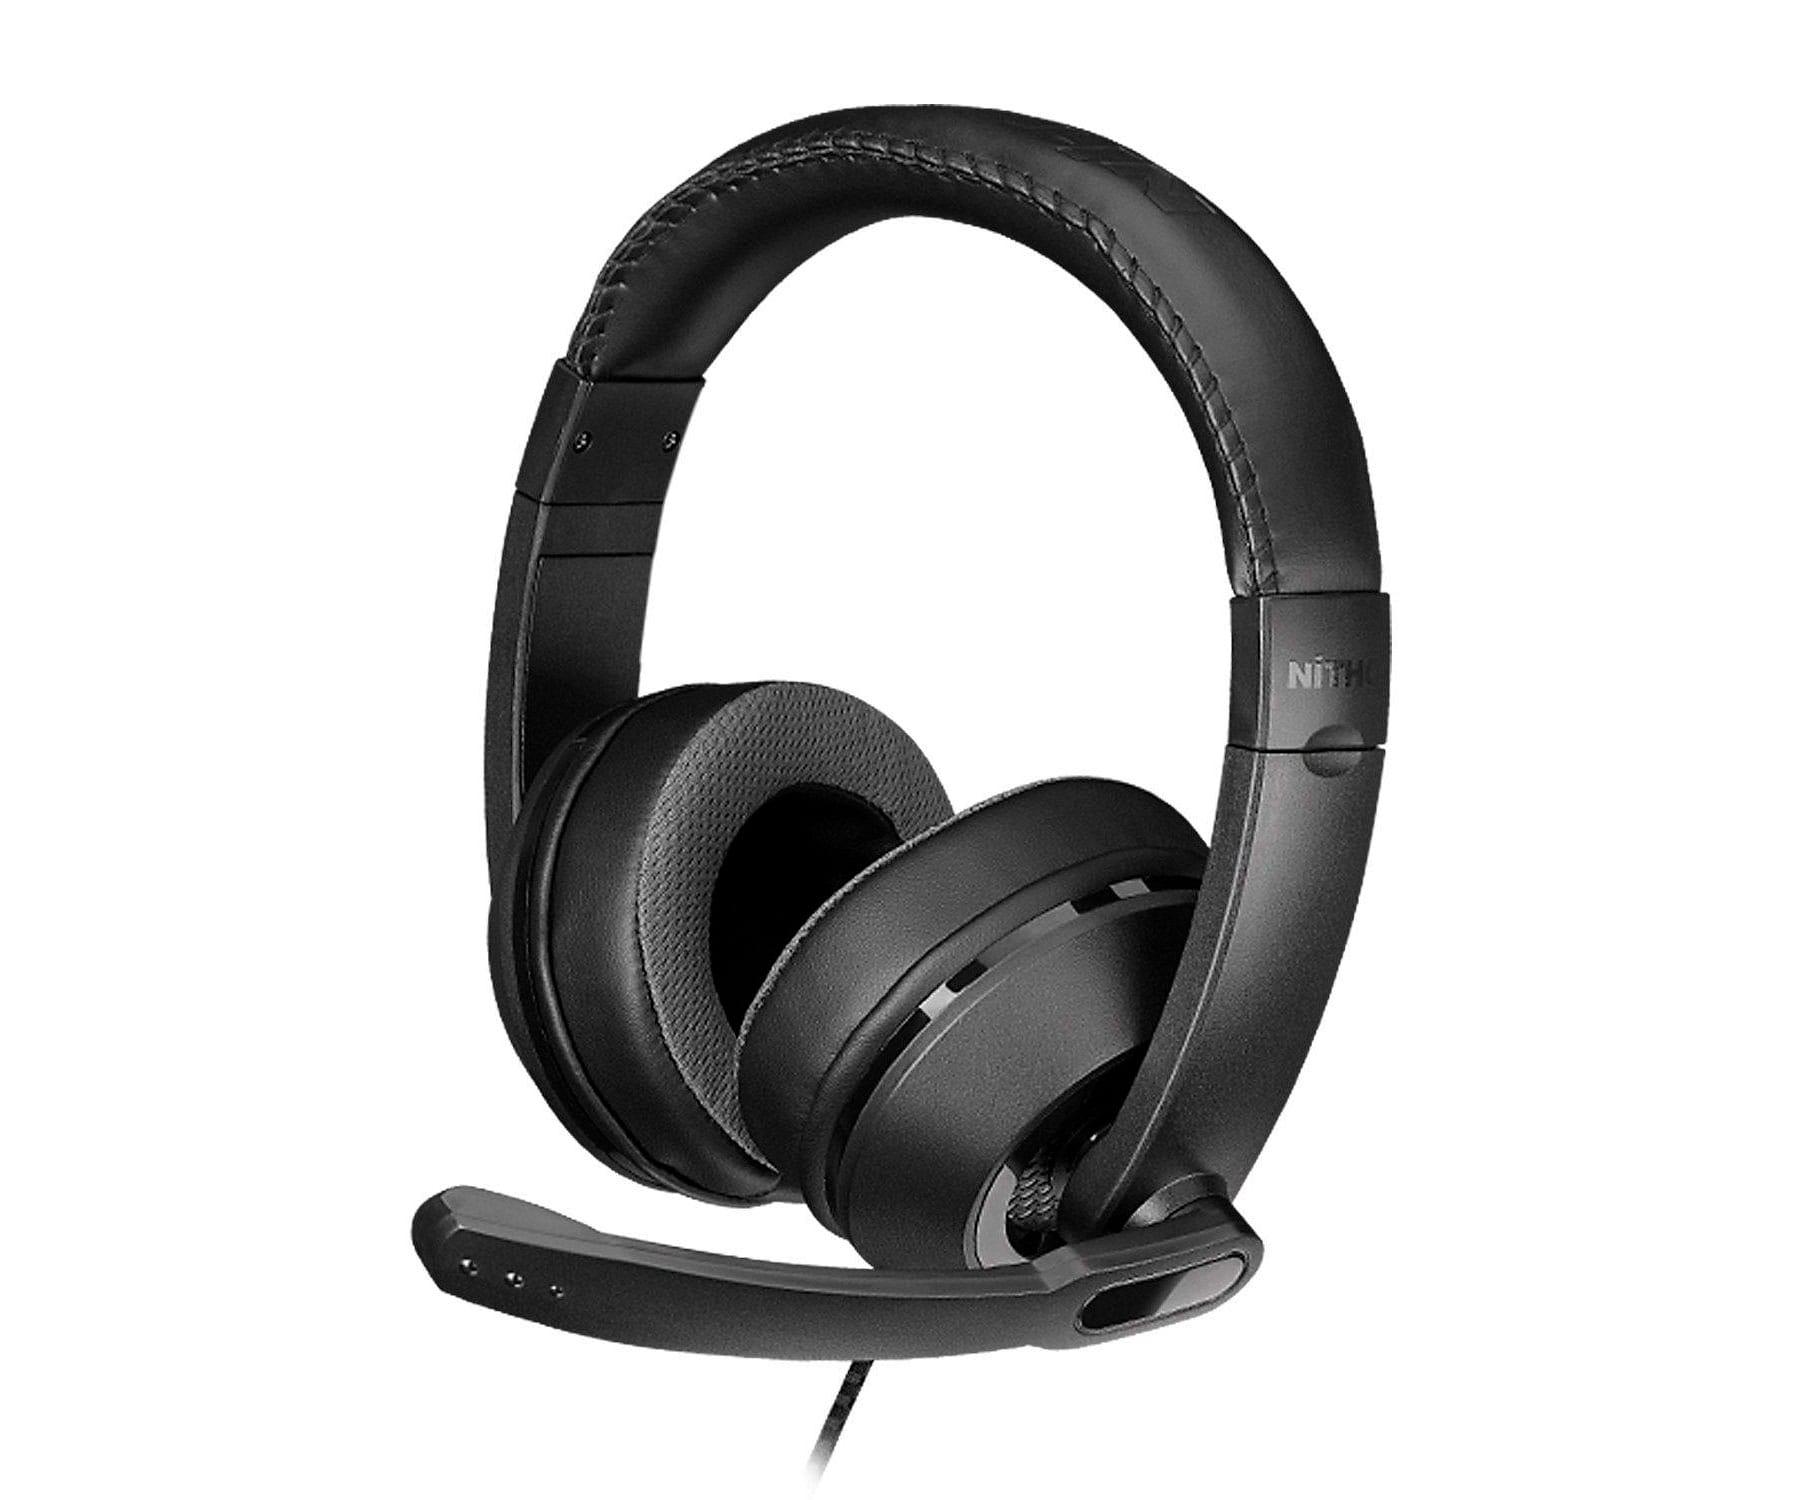 Nitho NX100s Auriculares Negro/Estéreo/Micrófono plegable